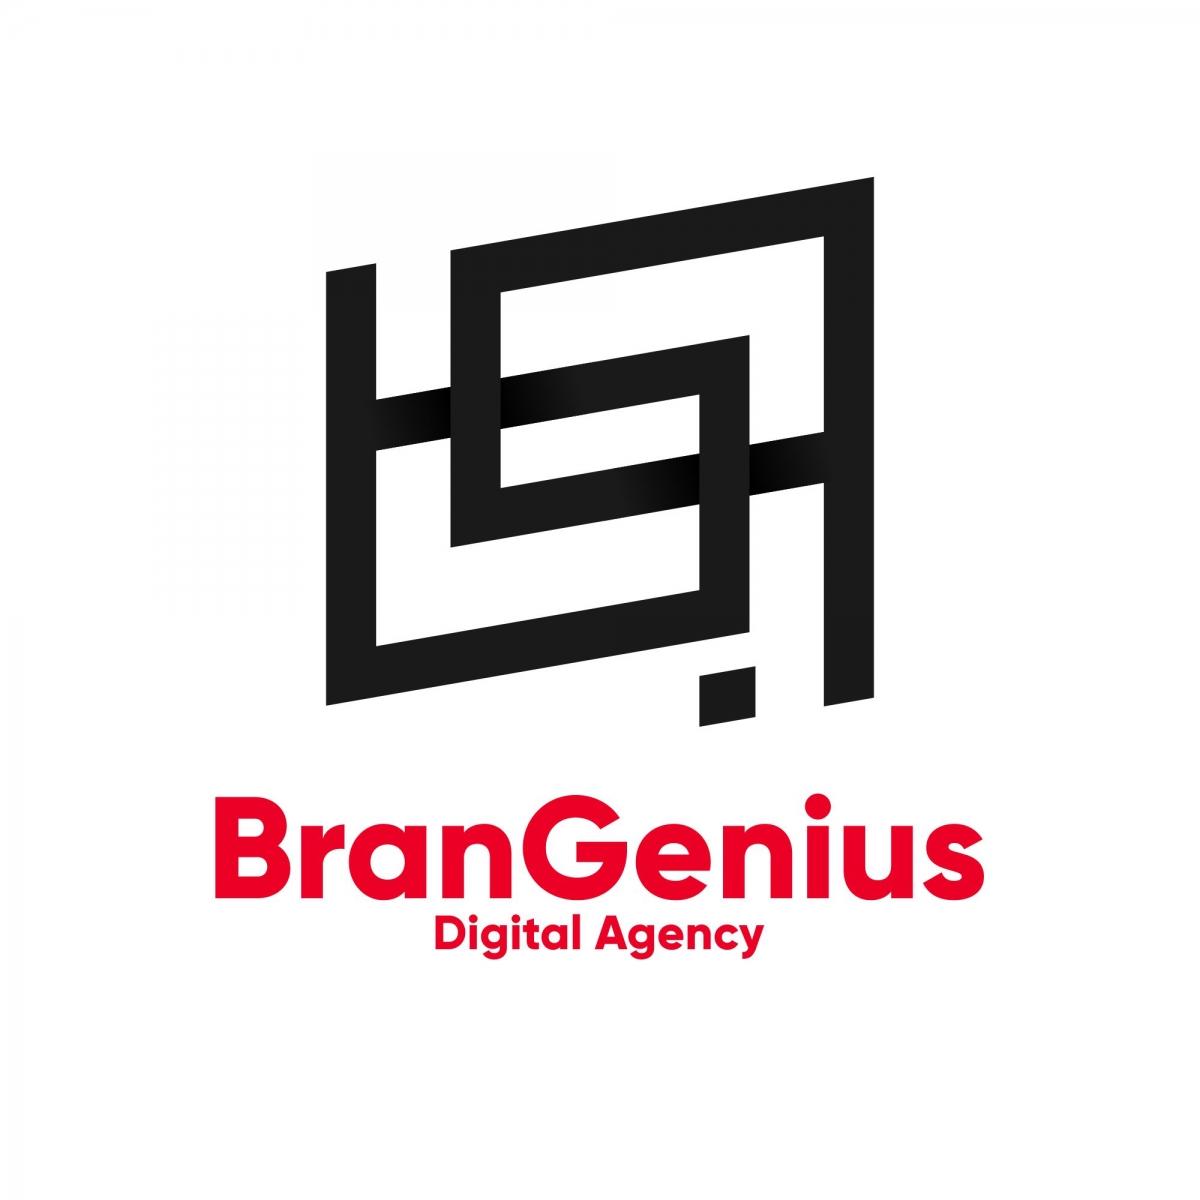 Brangenius Digital Agency